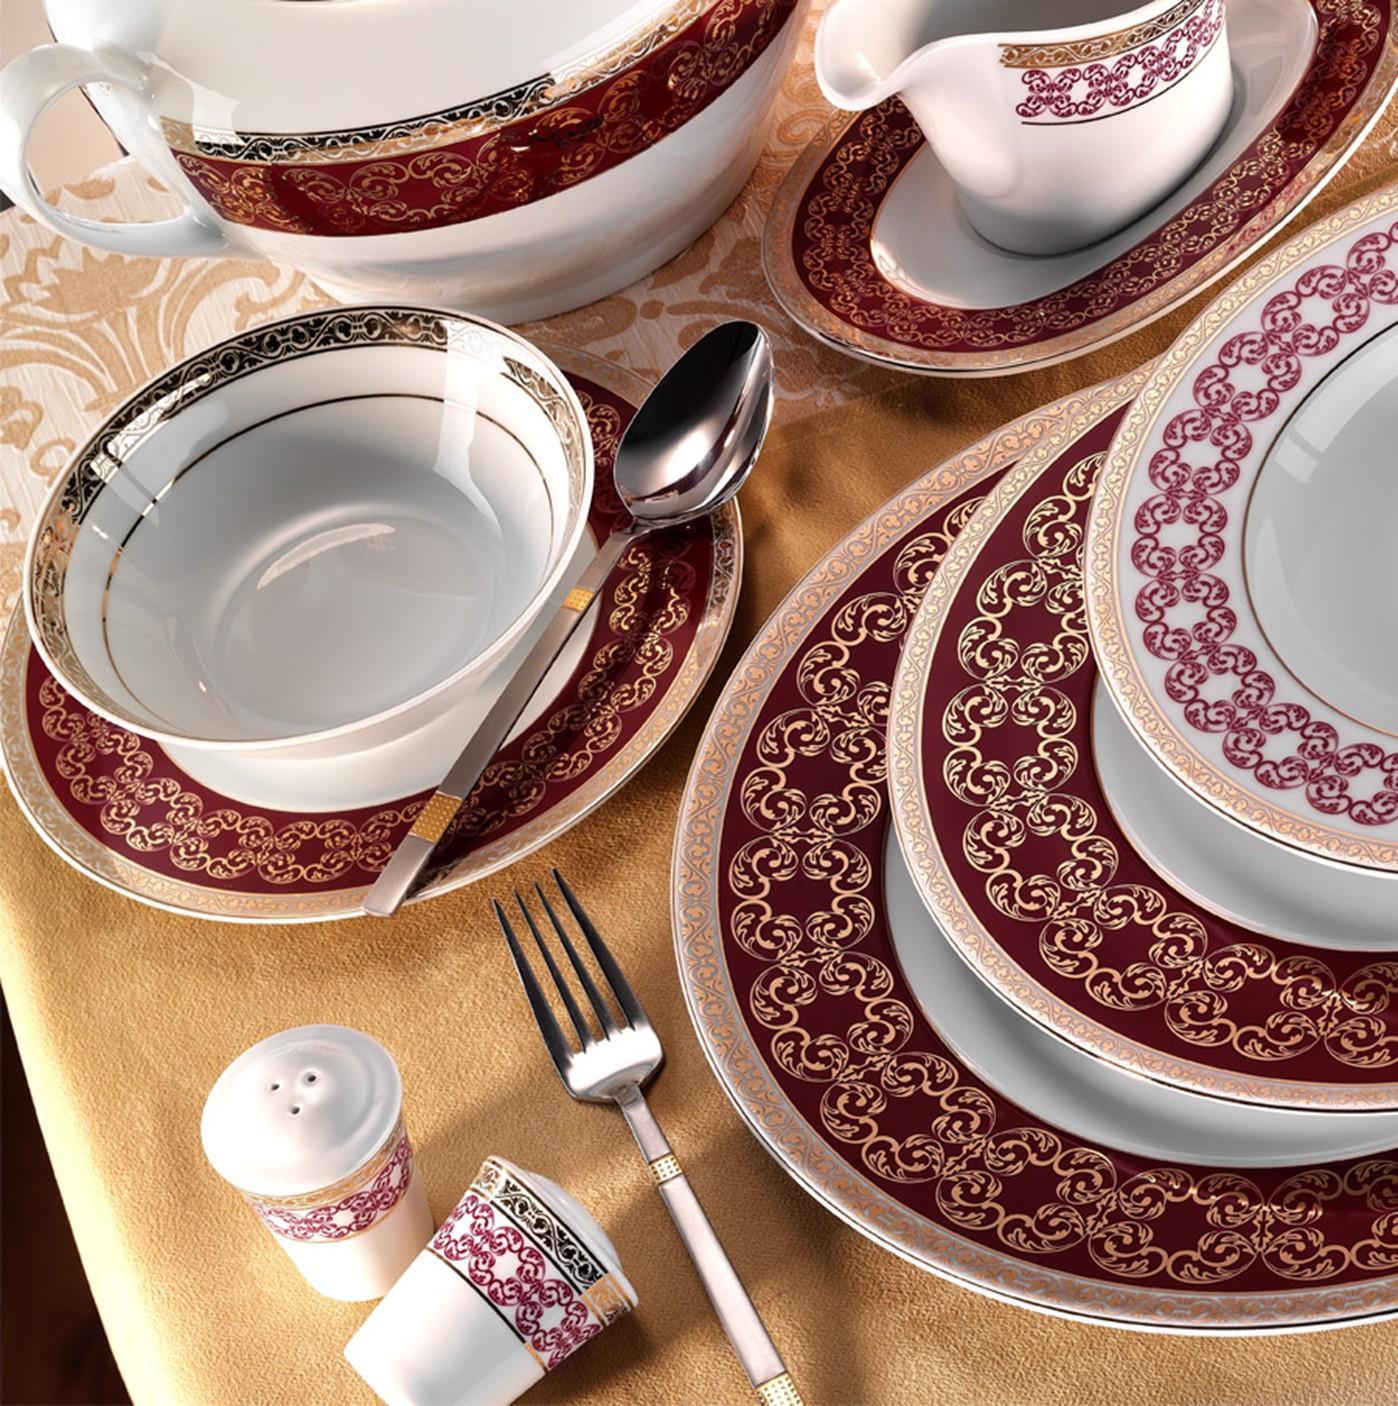 Kutahya Porselen LEONBERG 97 Pieces 7799 Patterned Dinnerware SeT